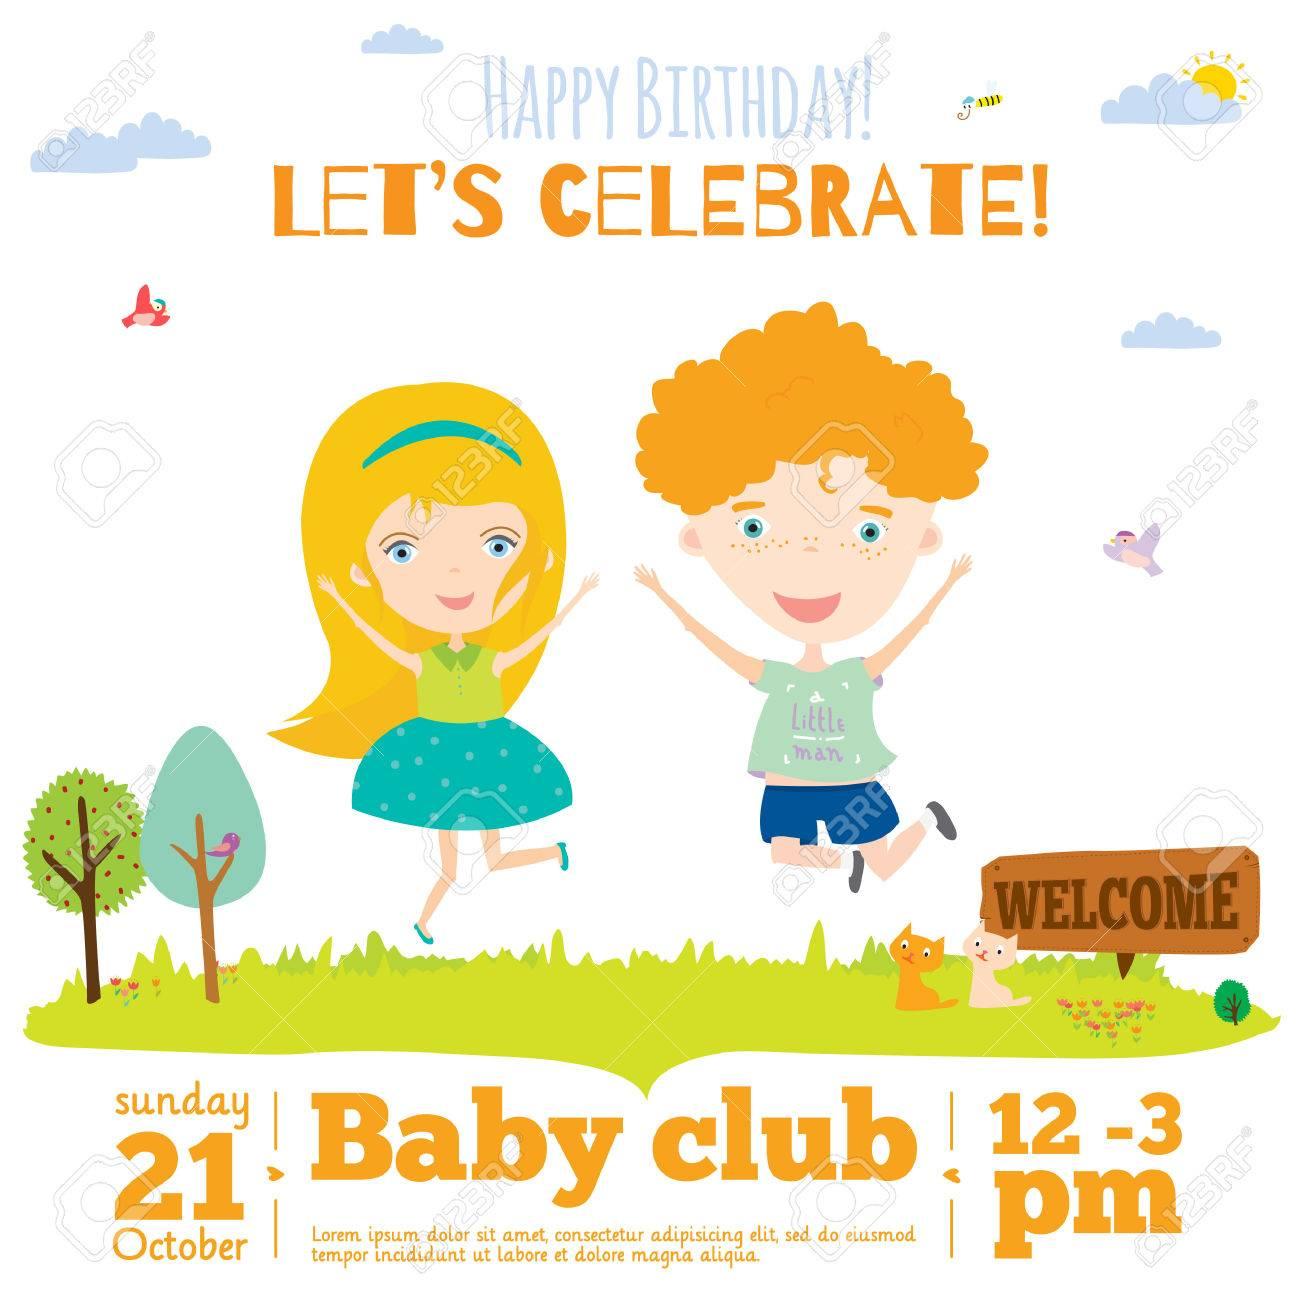 kids beach party invitation - Keni.candlecomfortzone.com